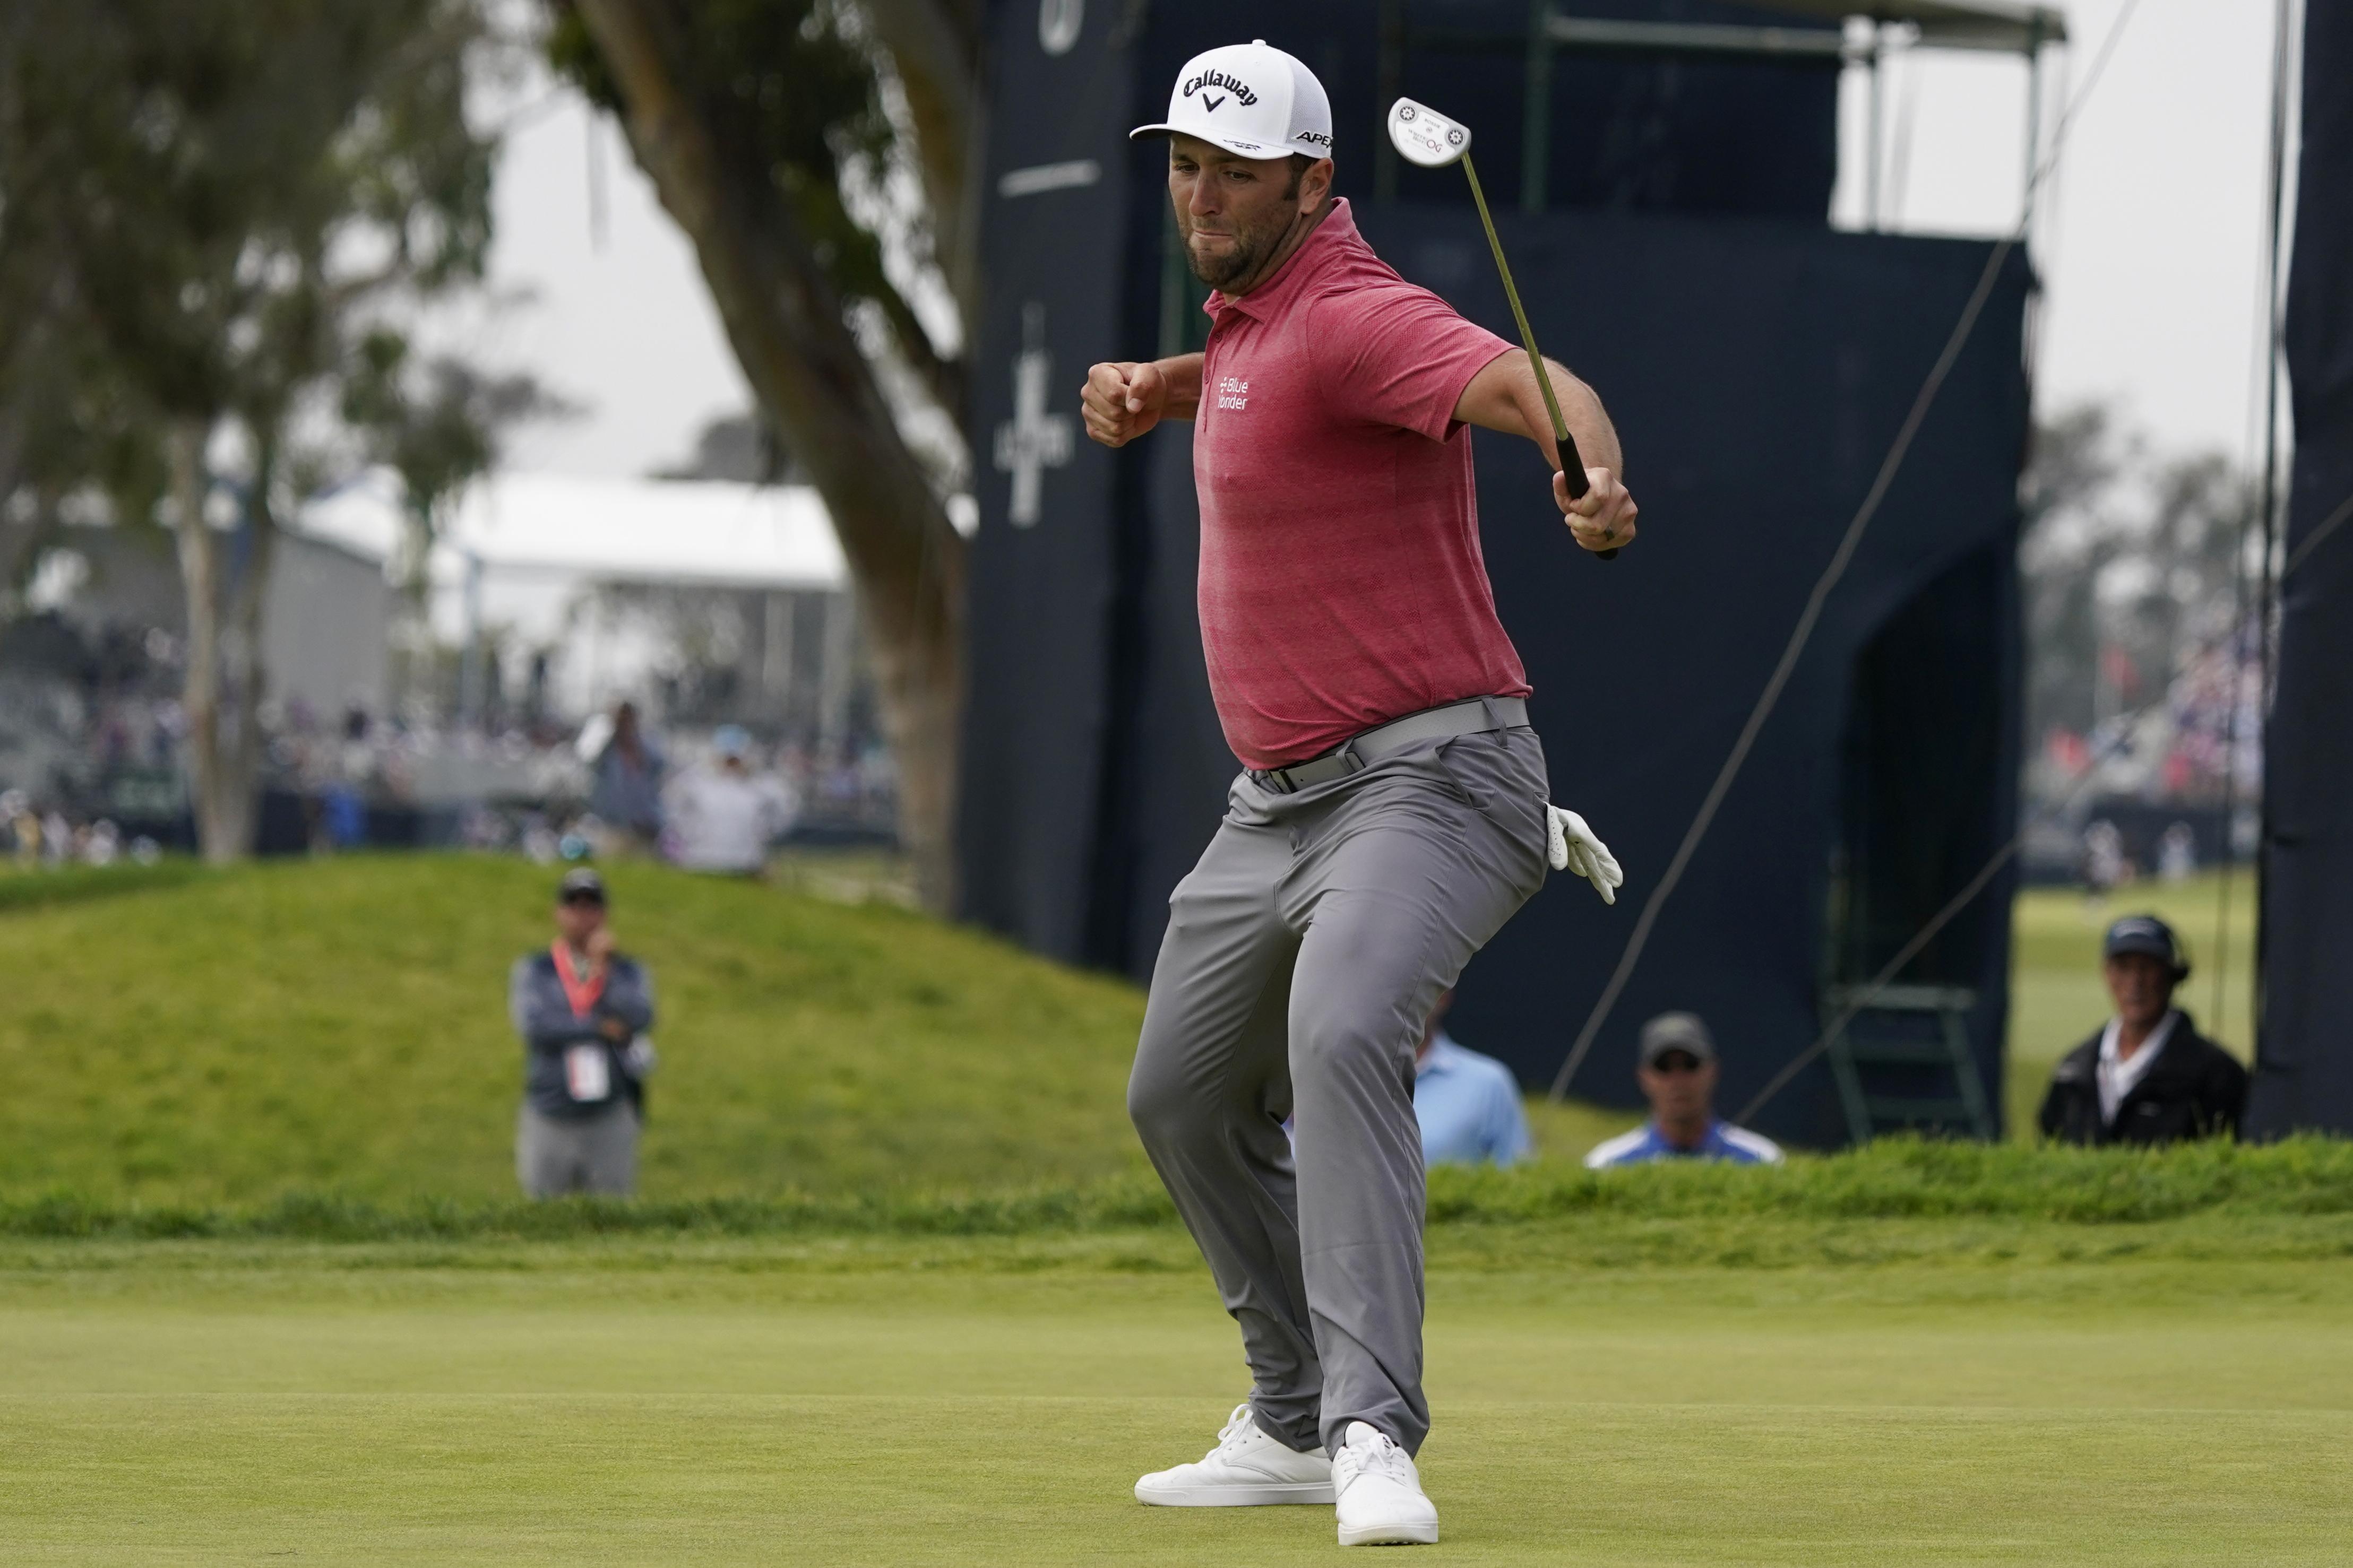 Spain S Jon Rahm Wins U S Open For First Career Major Championship The Washington Post